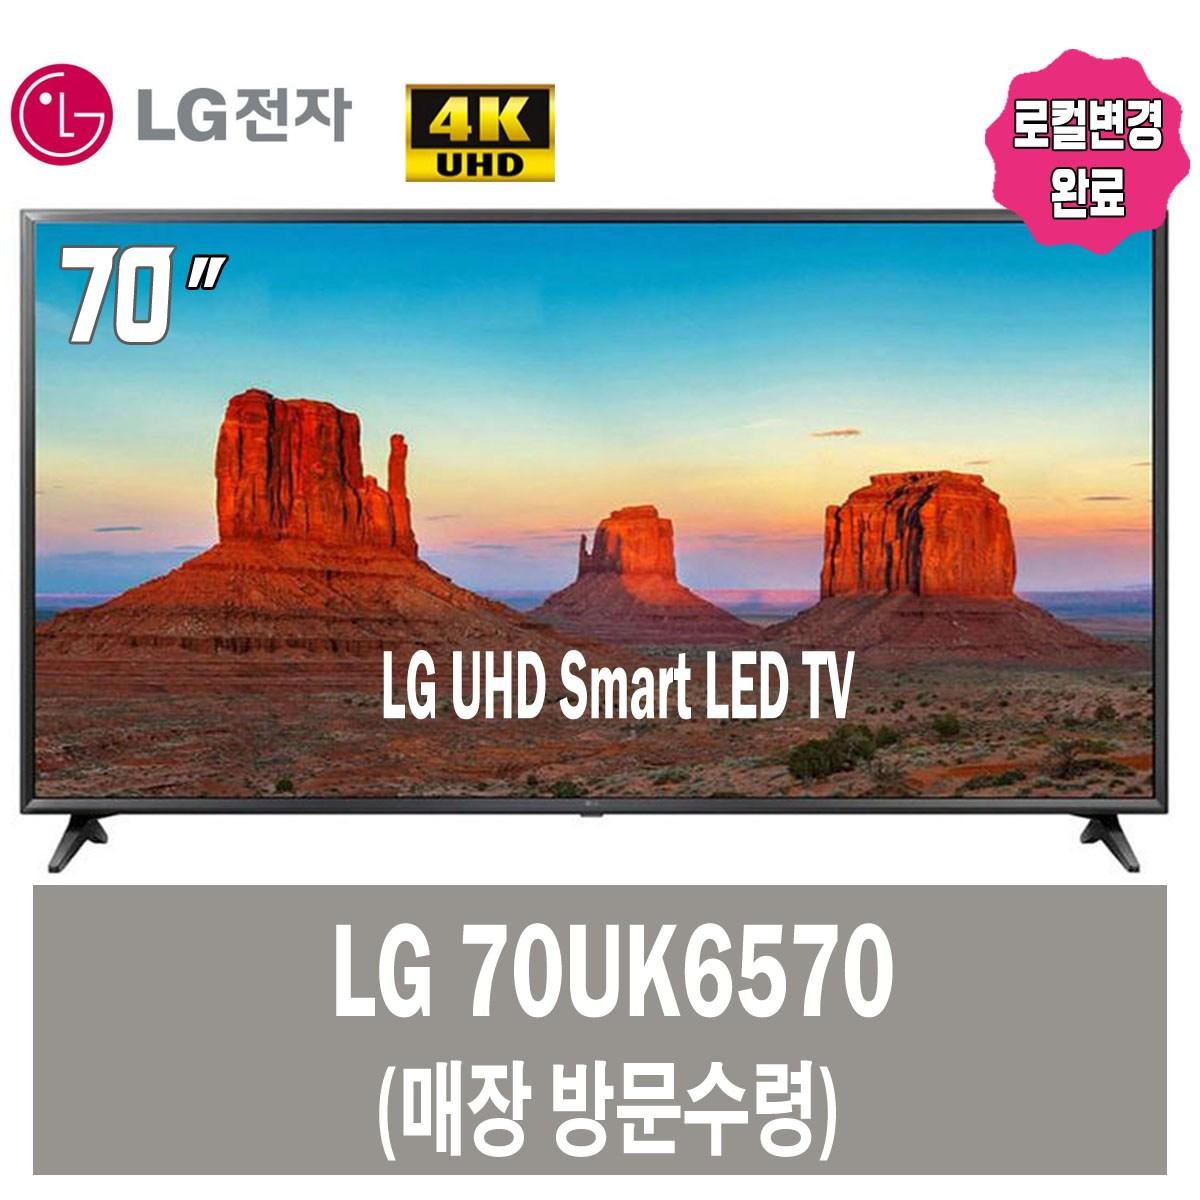 LG전자 리퍼티비 70인치 리퍼TV 70UK6570, 자가설치, 매장 방문수령